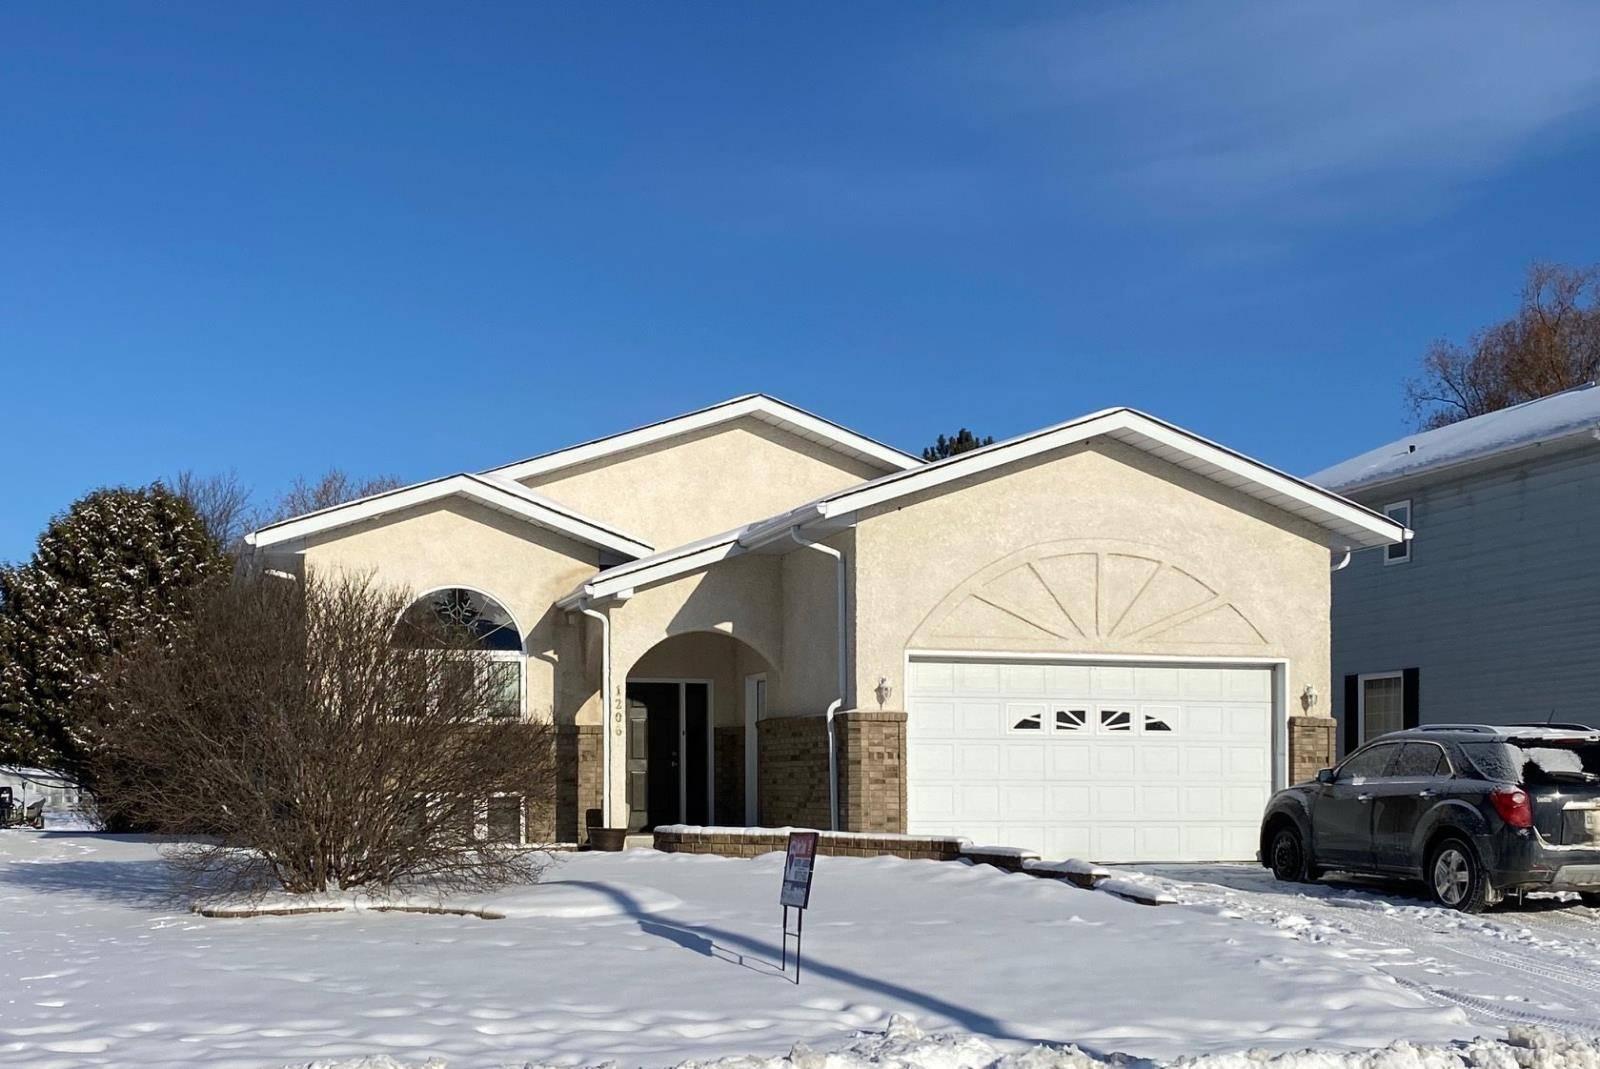 House for sale at 1206 Elizabeth St E Fort Frances Ontario - MLS: TB193077